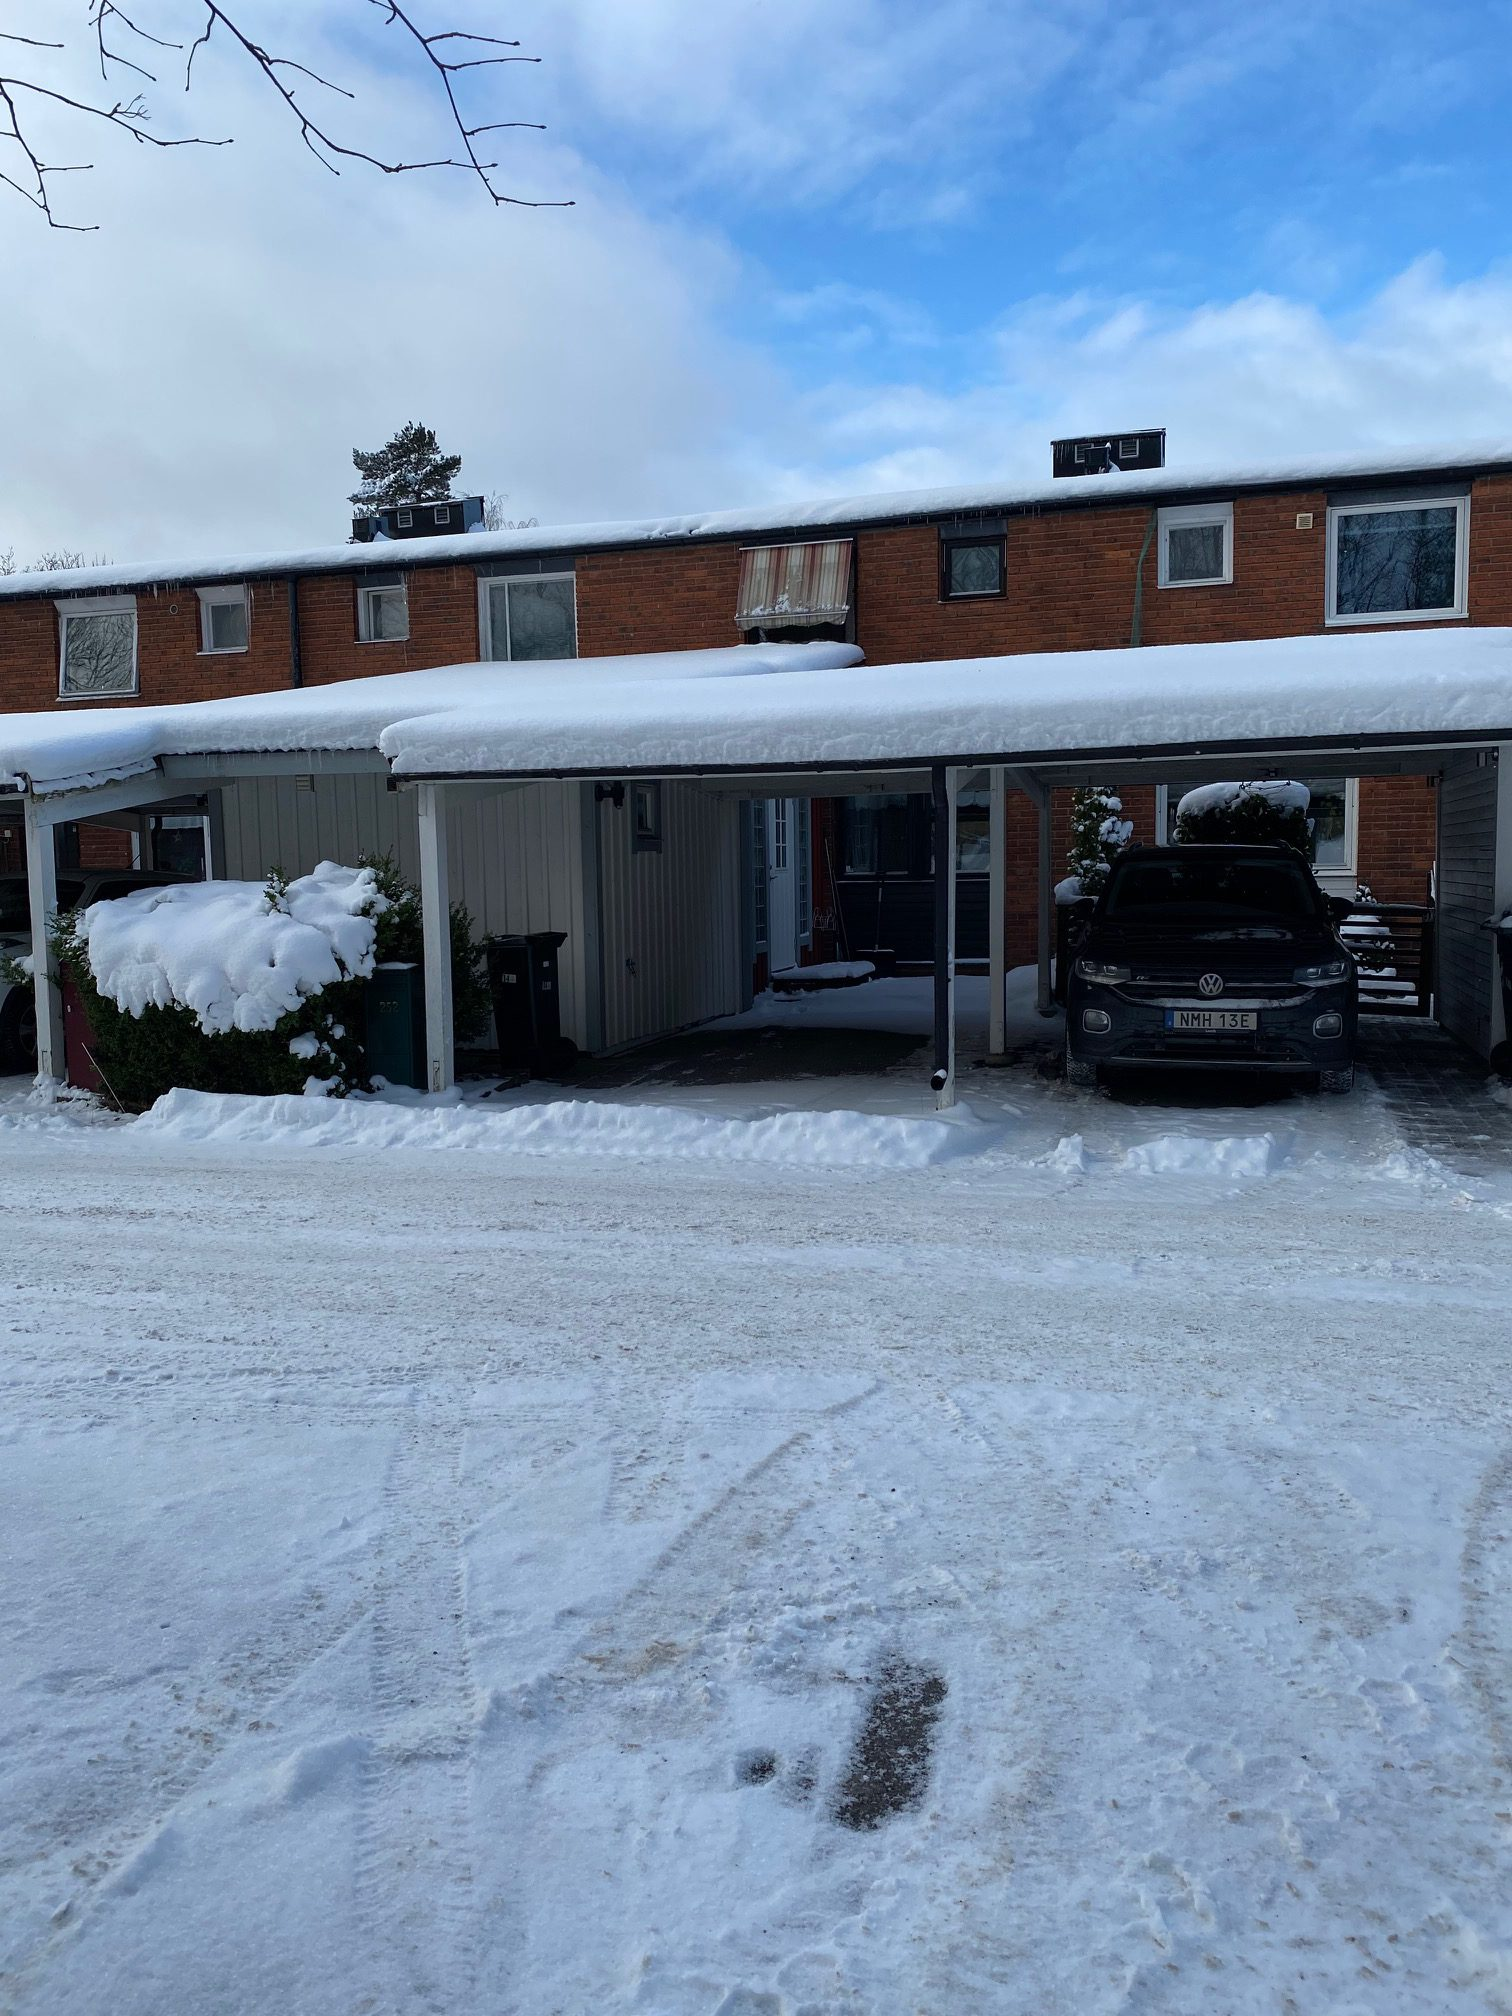 Radhus i Bandhagen